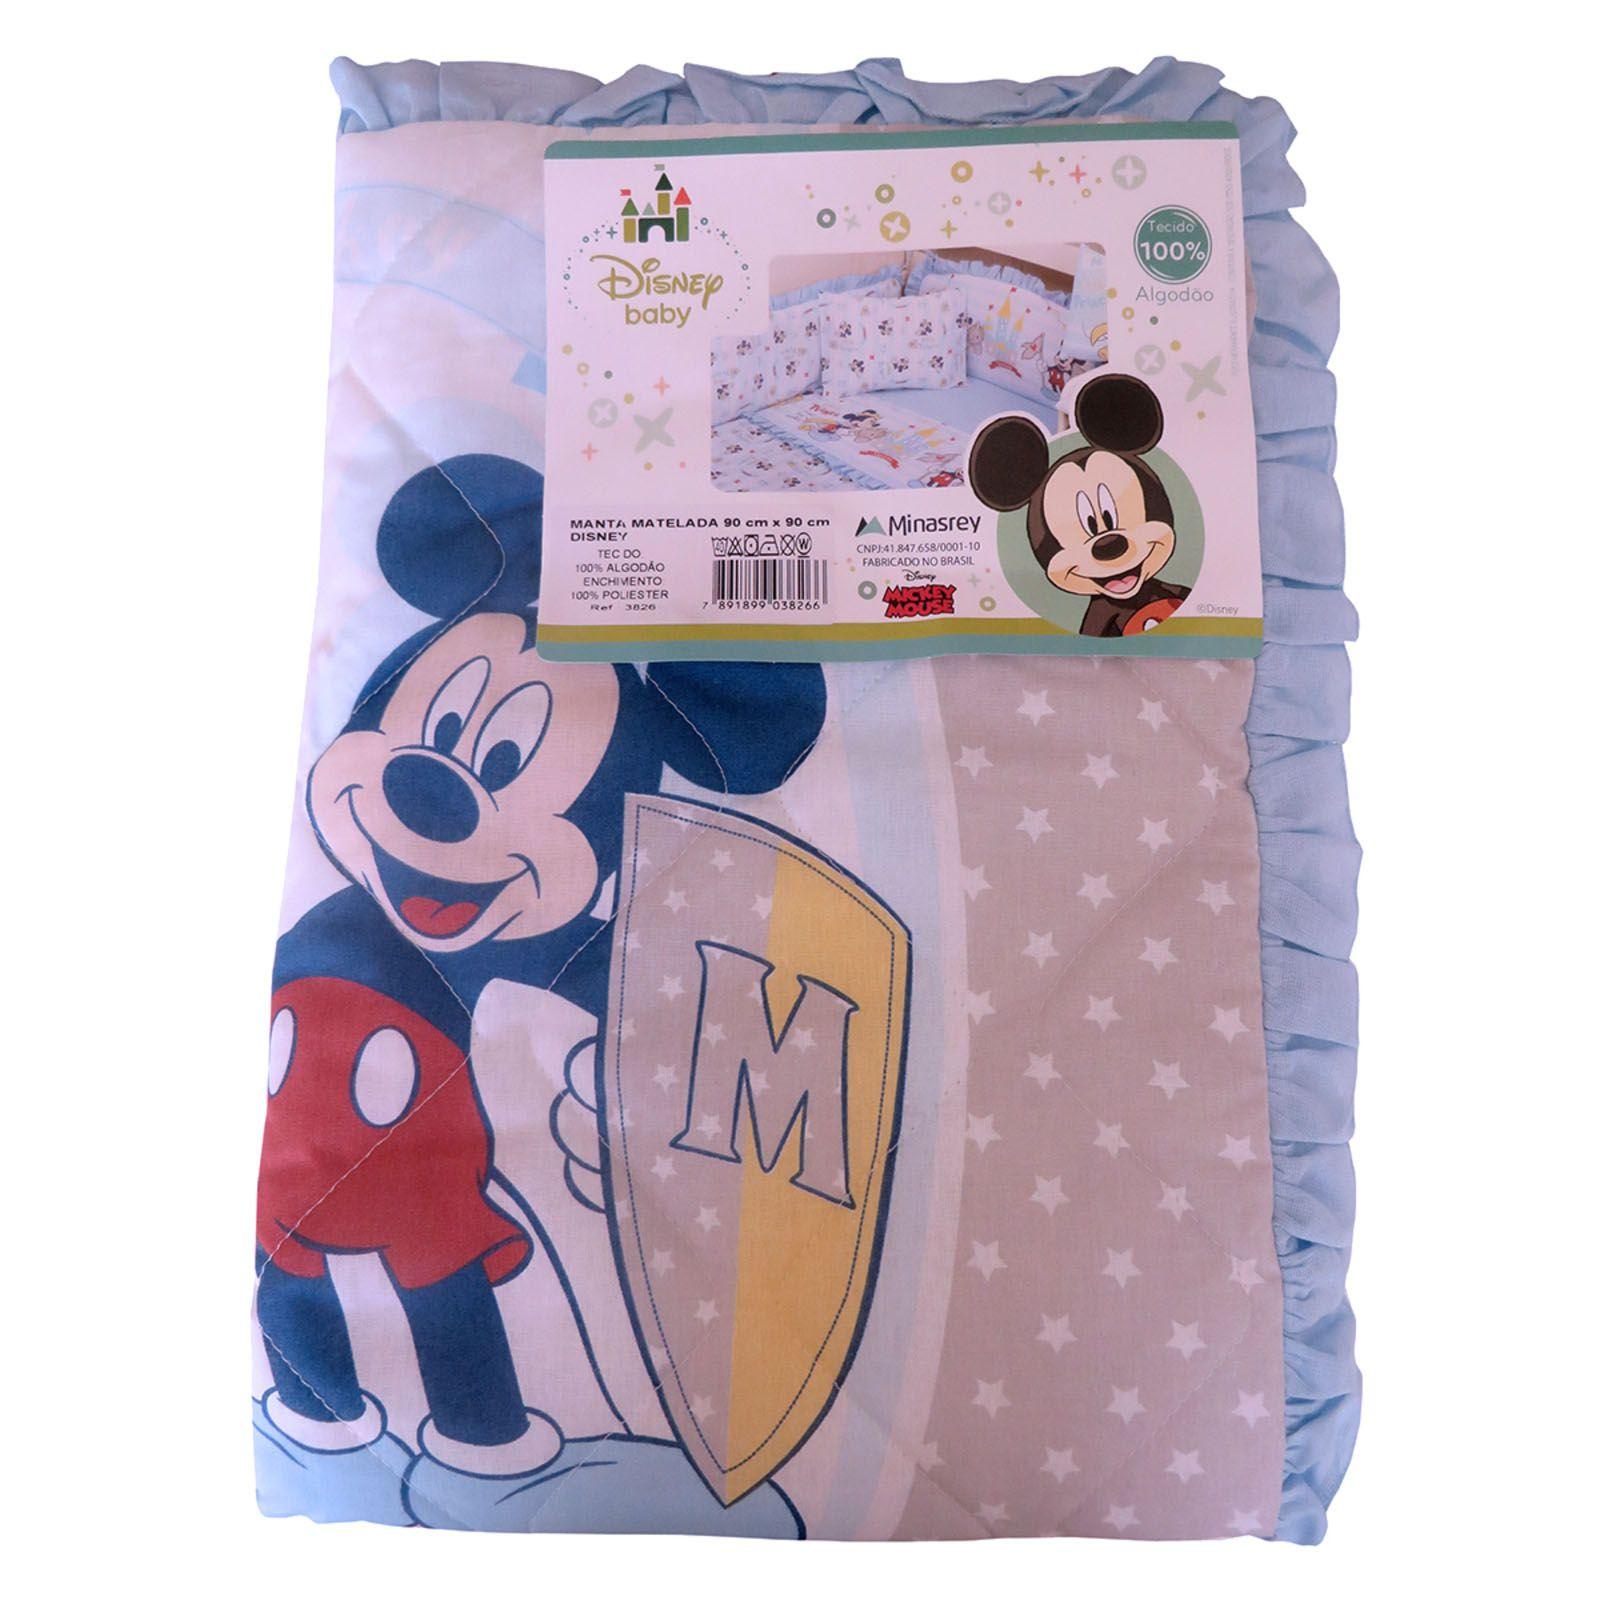 Bebê Manta Matelada Recém Nascido Enxoval Disney Cobertor - Mickey